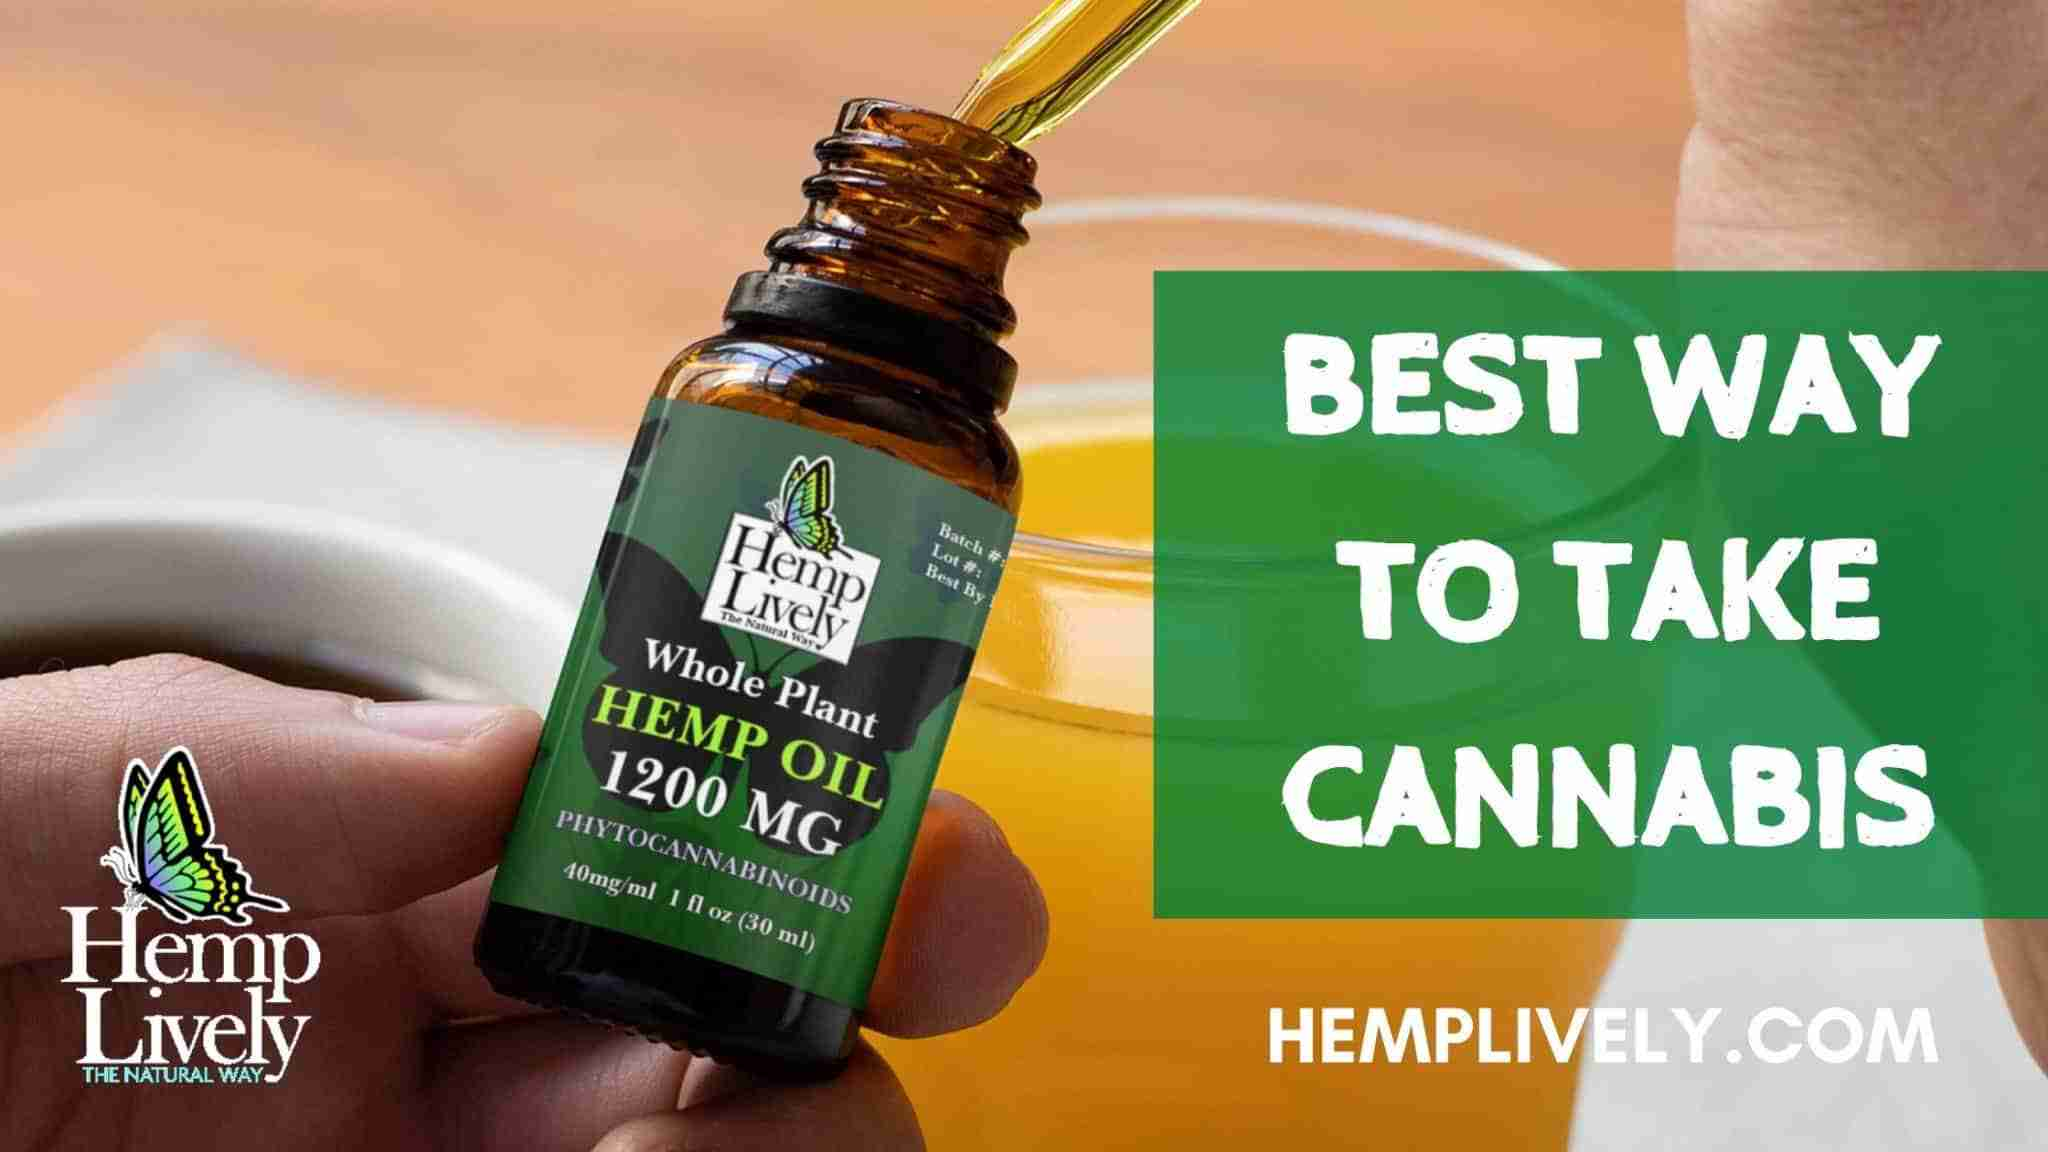 Best way to take cannabis